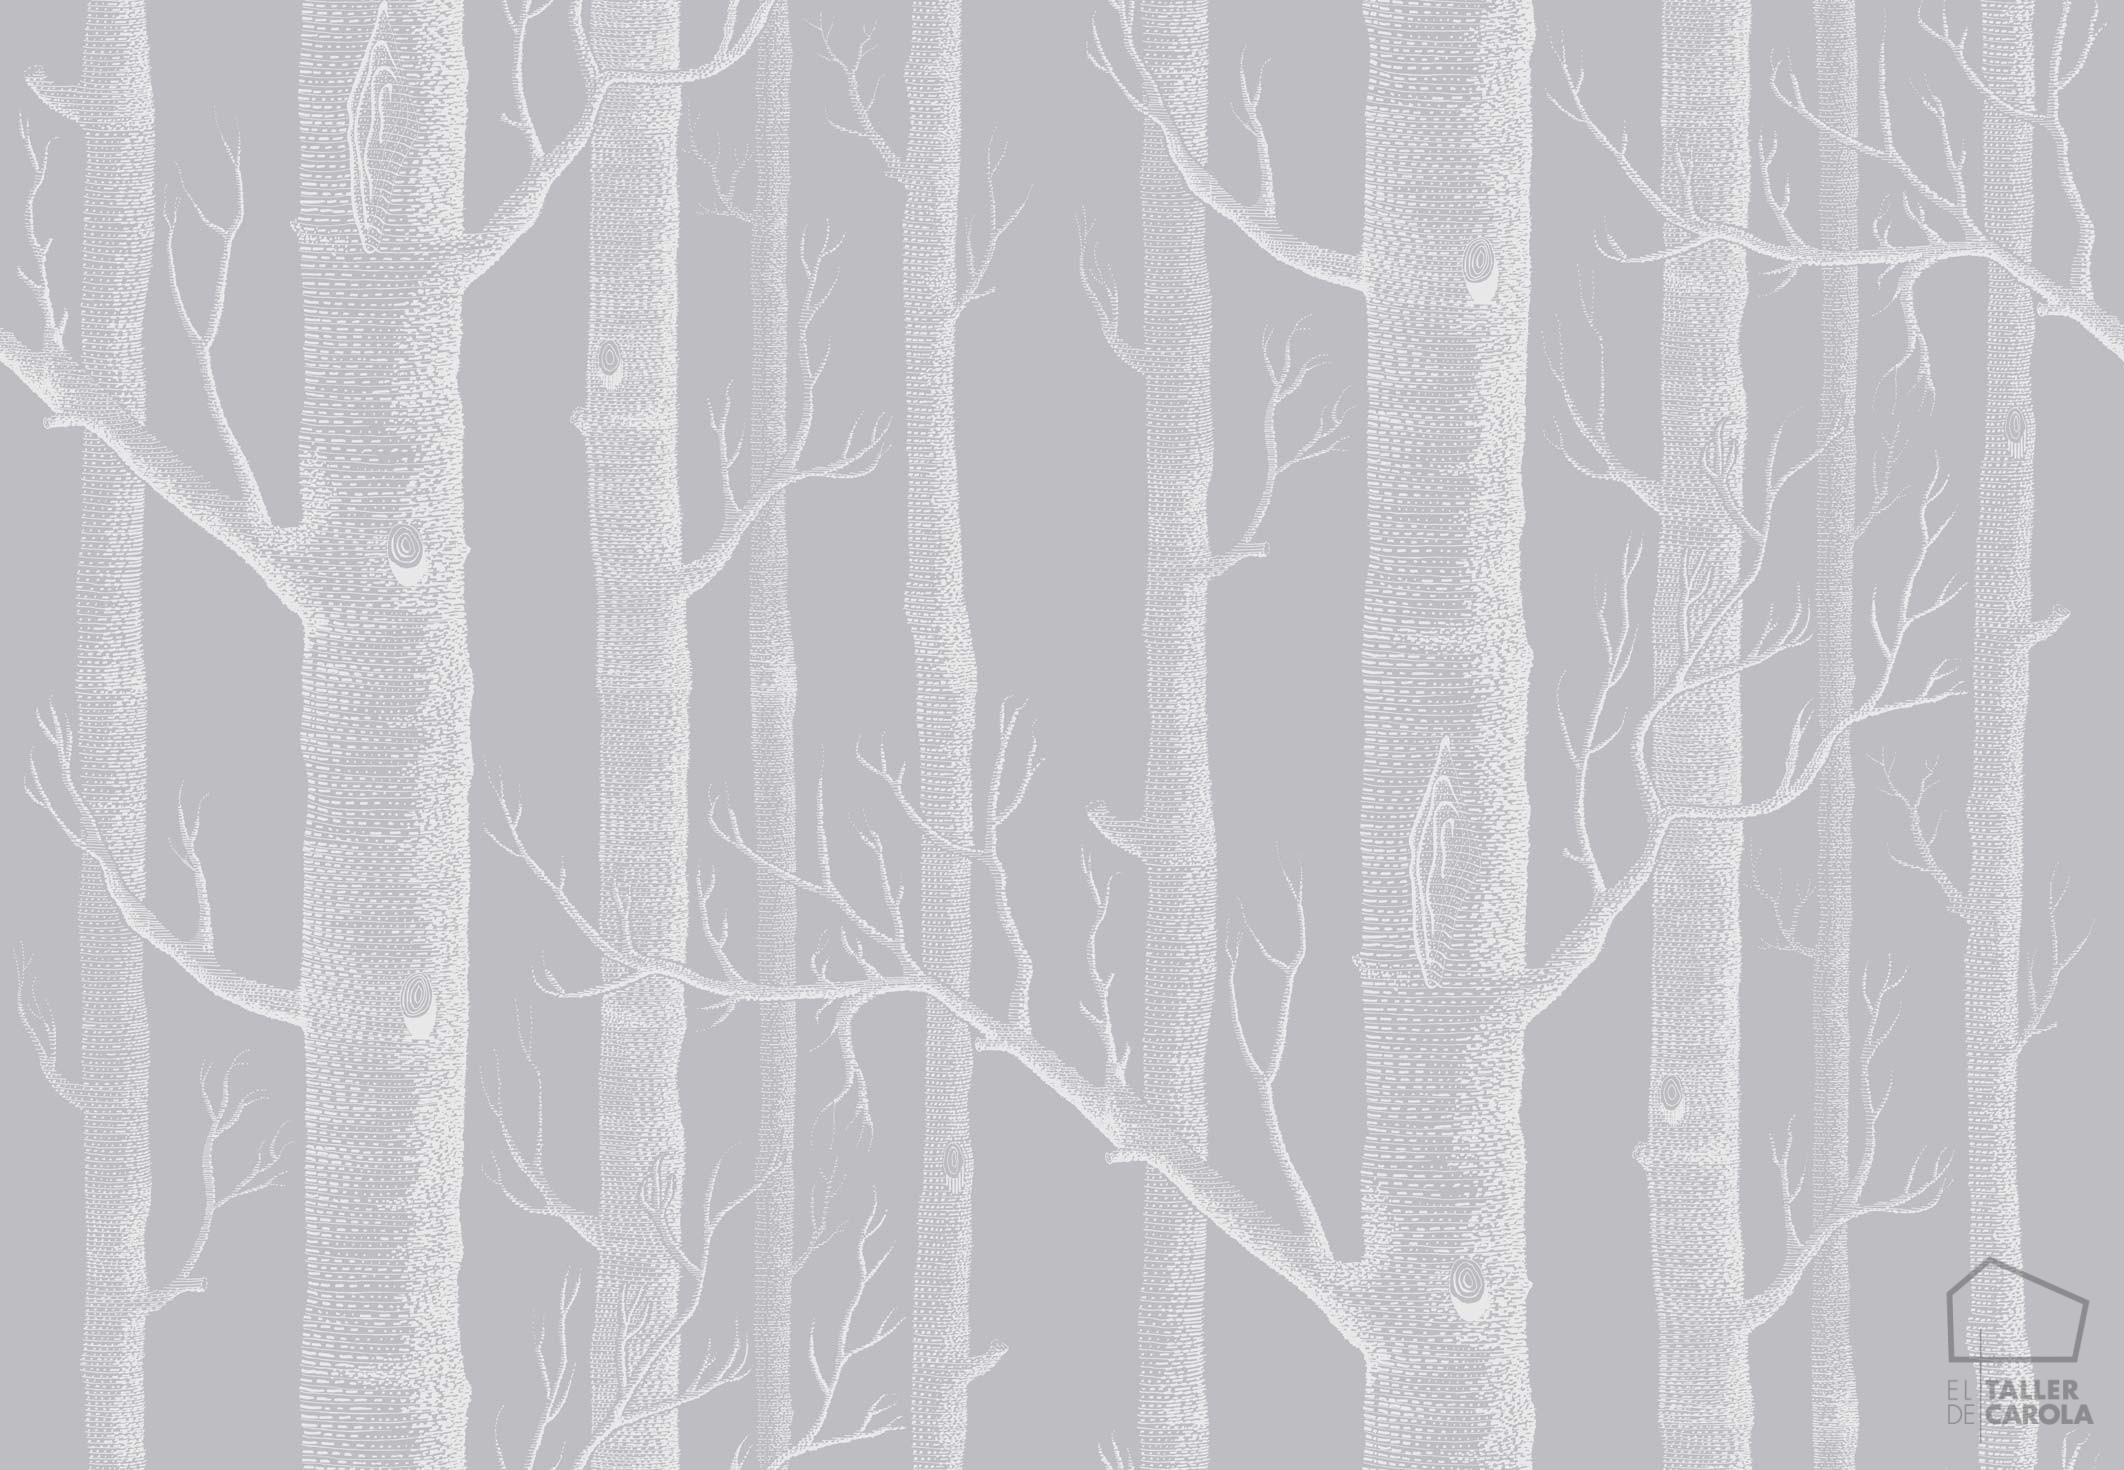 083icowoo112-3012-papeles-pintados-arboles-gris